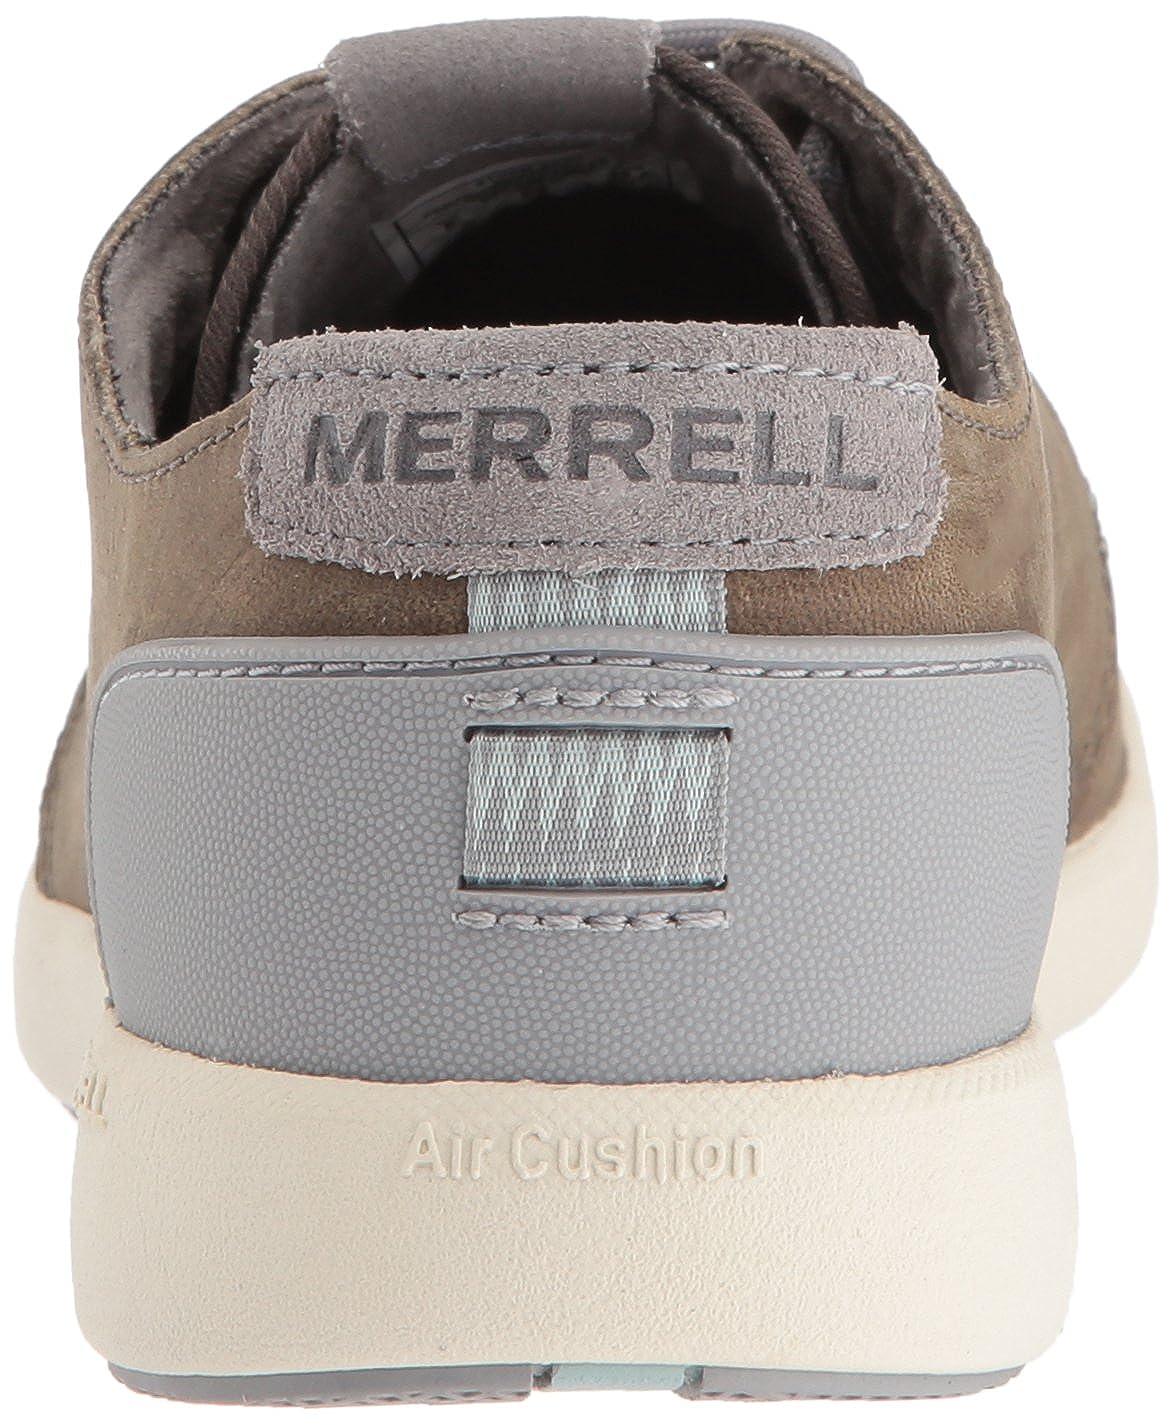 Merrell MerrellFREEWHEEL Lace Lace Lace - Freewheel Lace Damen  2b05eb